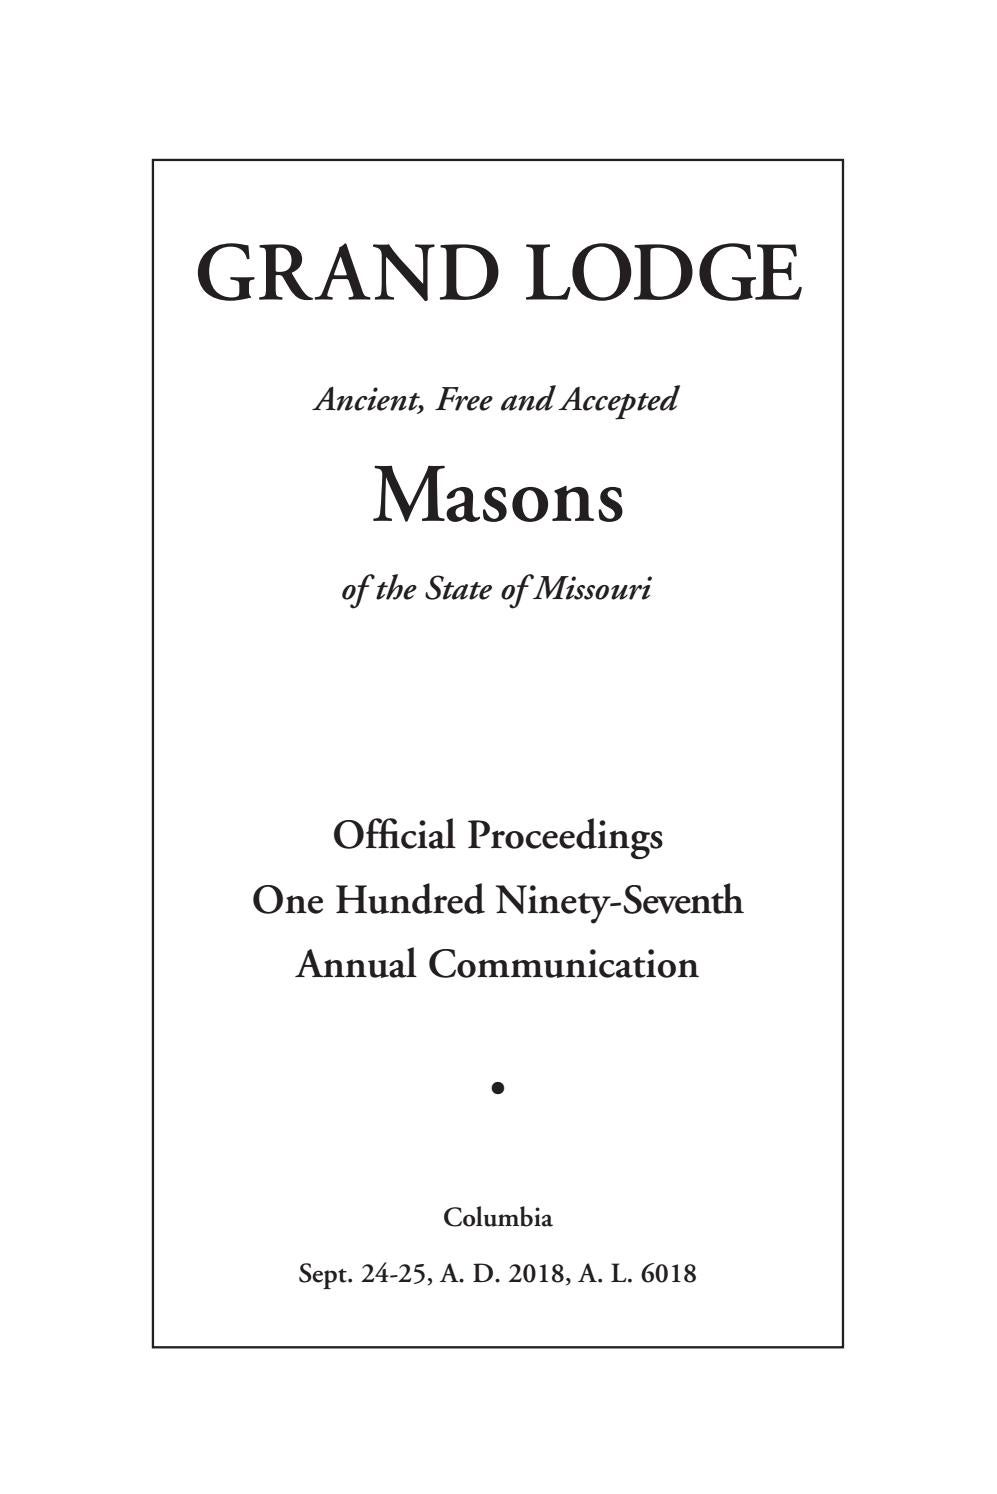 Duke Academic Calendar 2020 19.Official Proceedings Grand Lodge Mo Annual Communication 2018 By